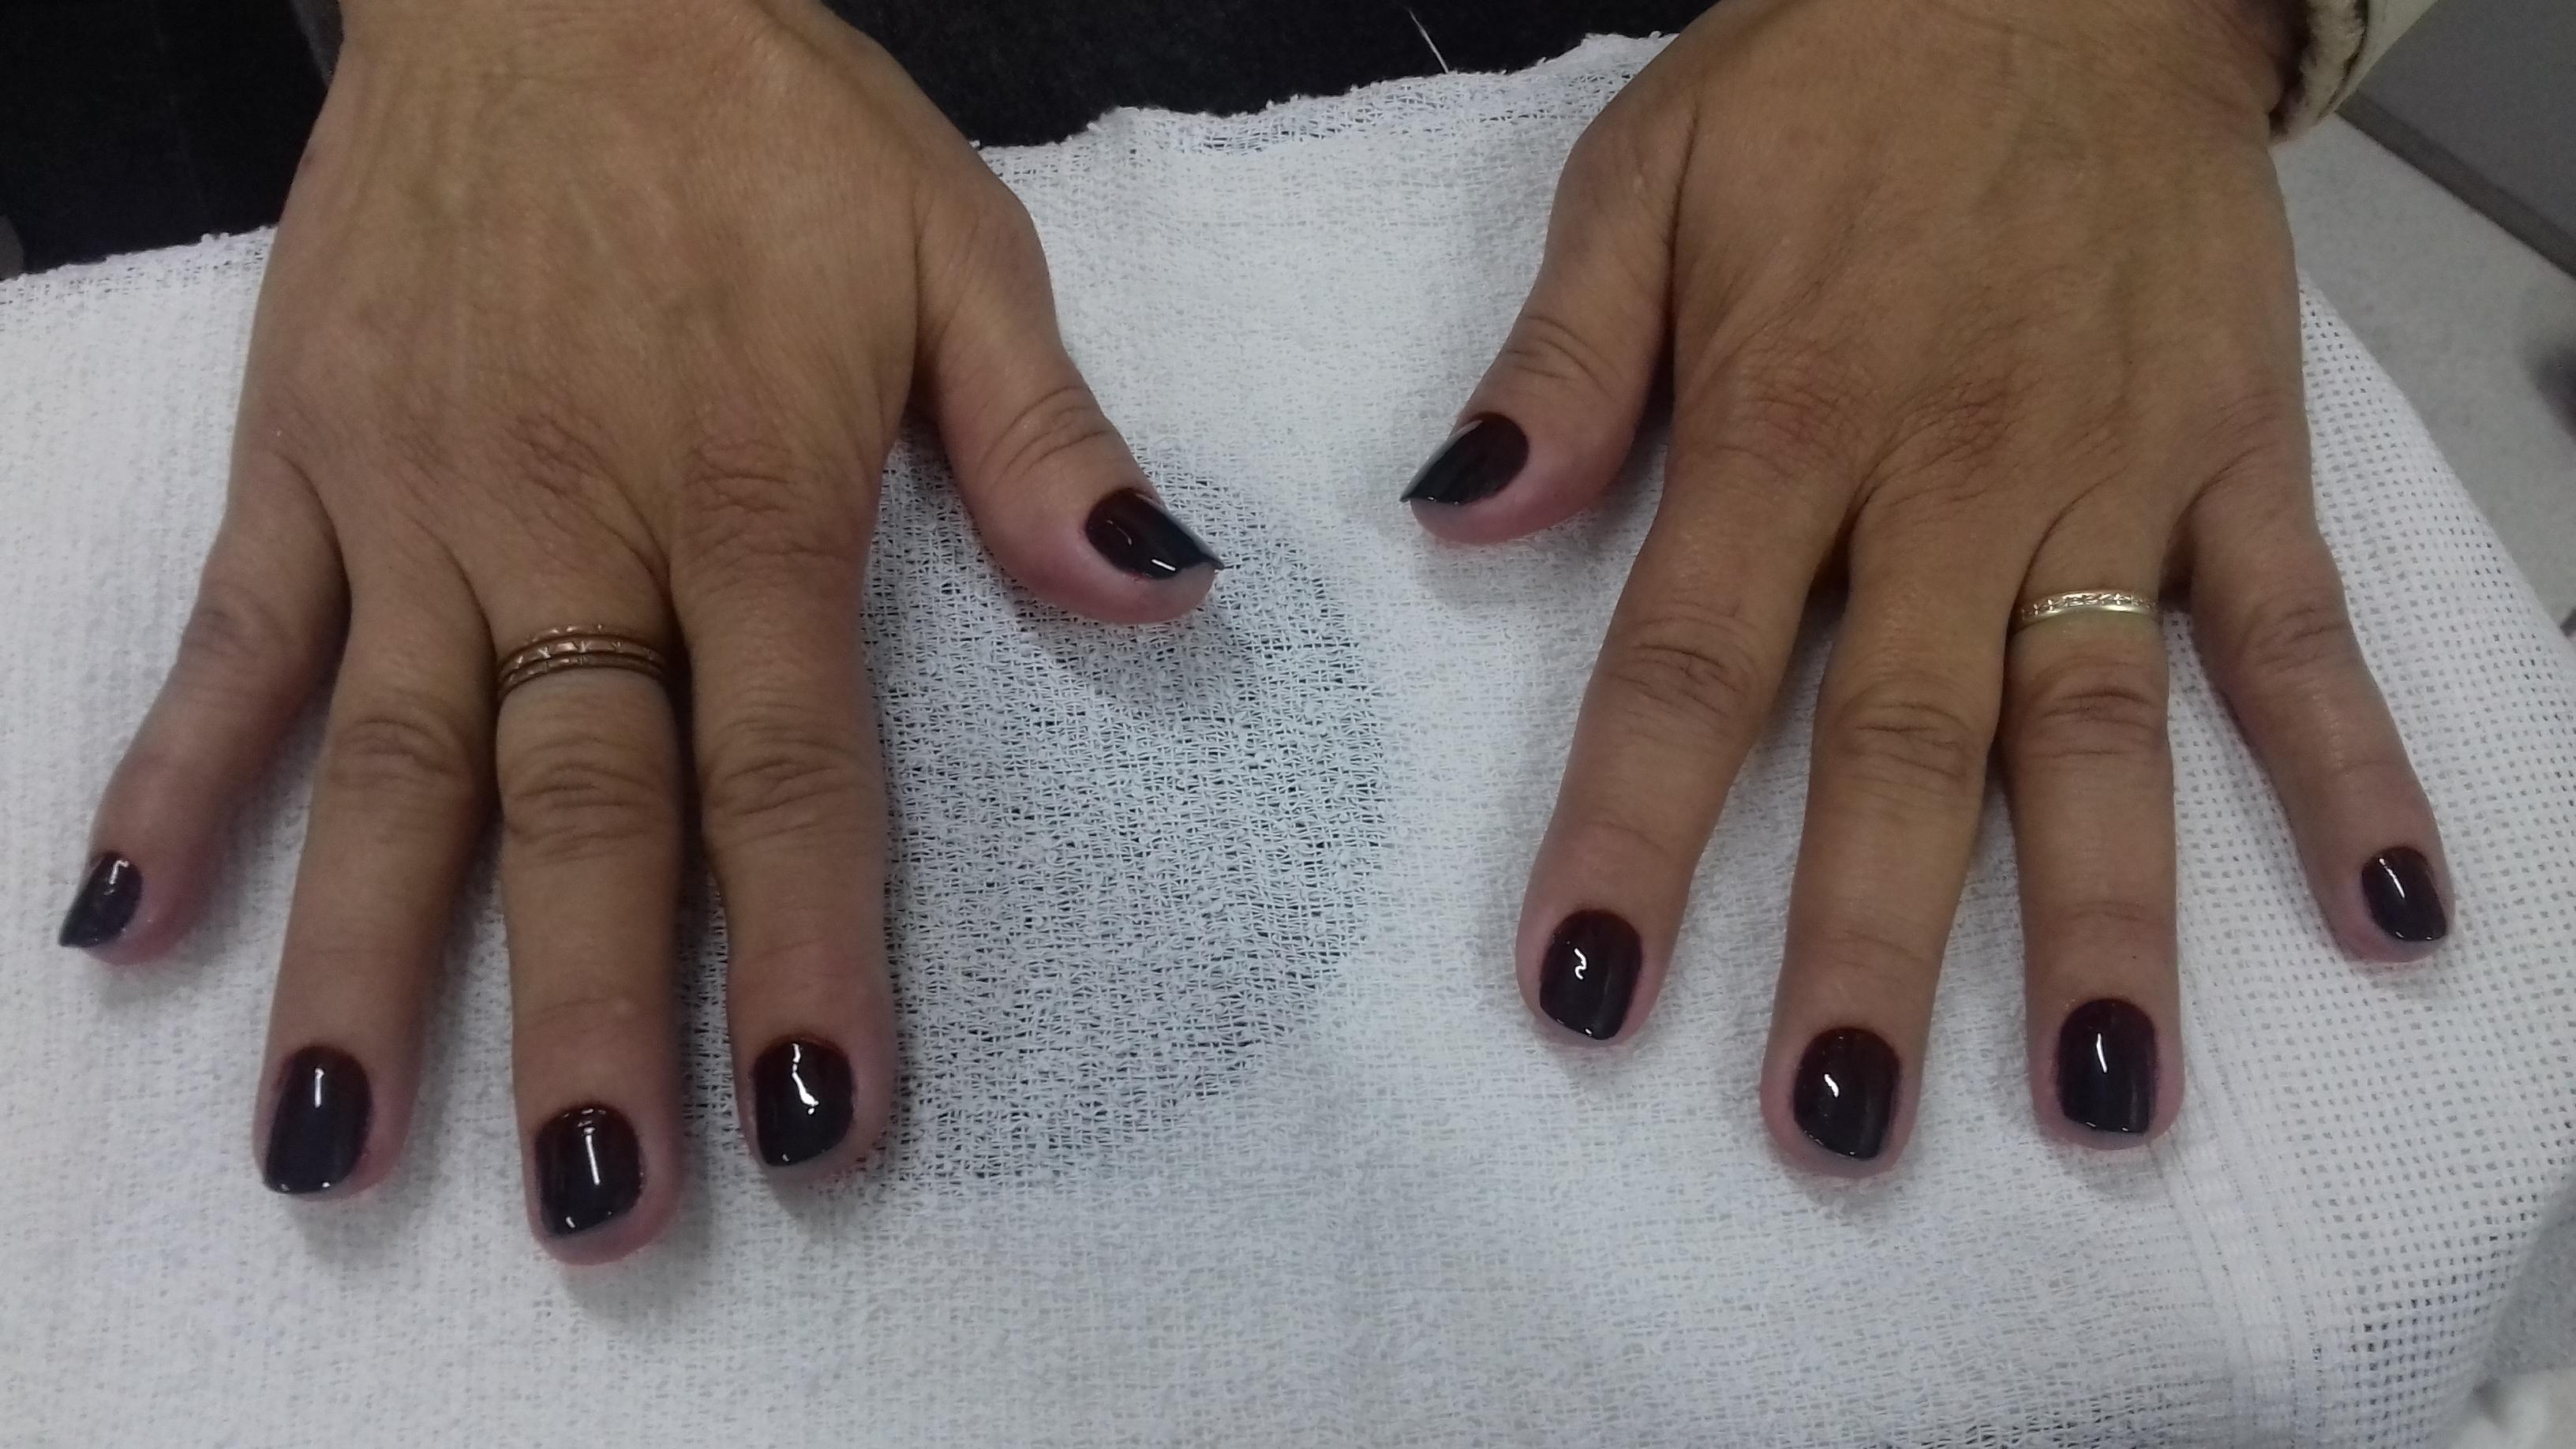 unha designer de sobrancelhas depilador(a) manicure e pedicure